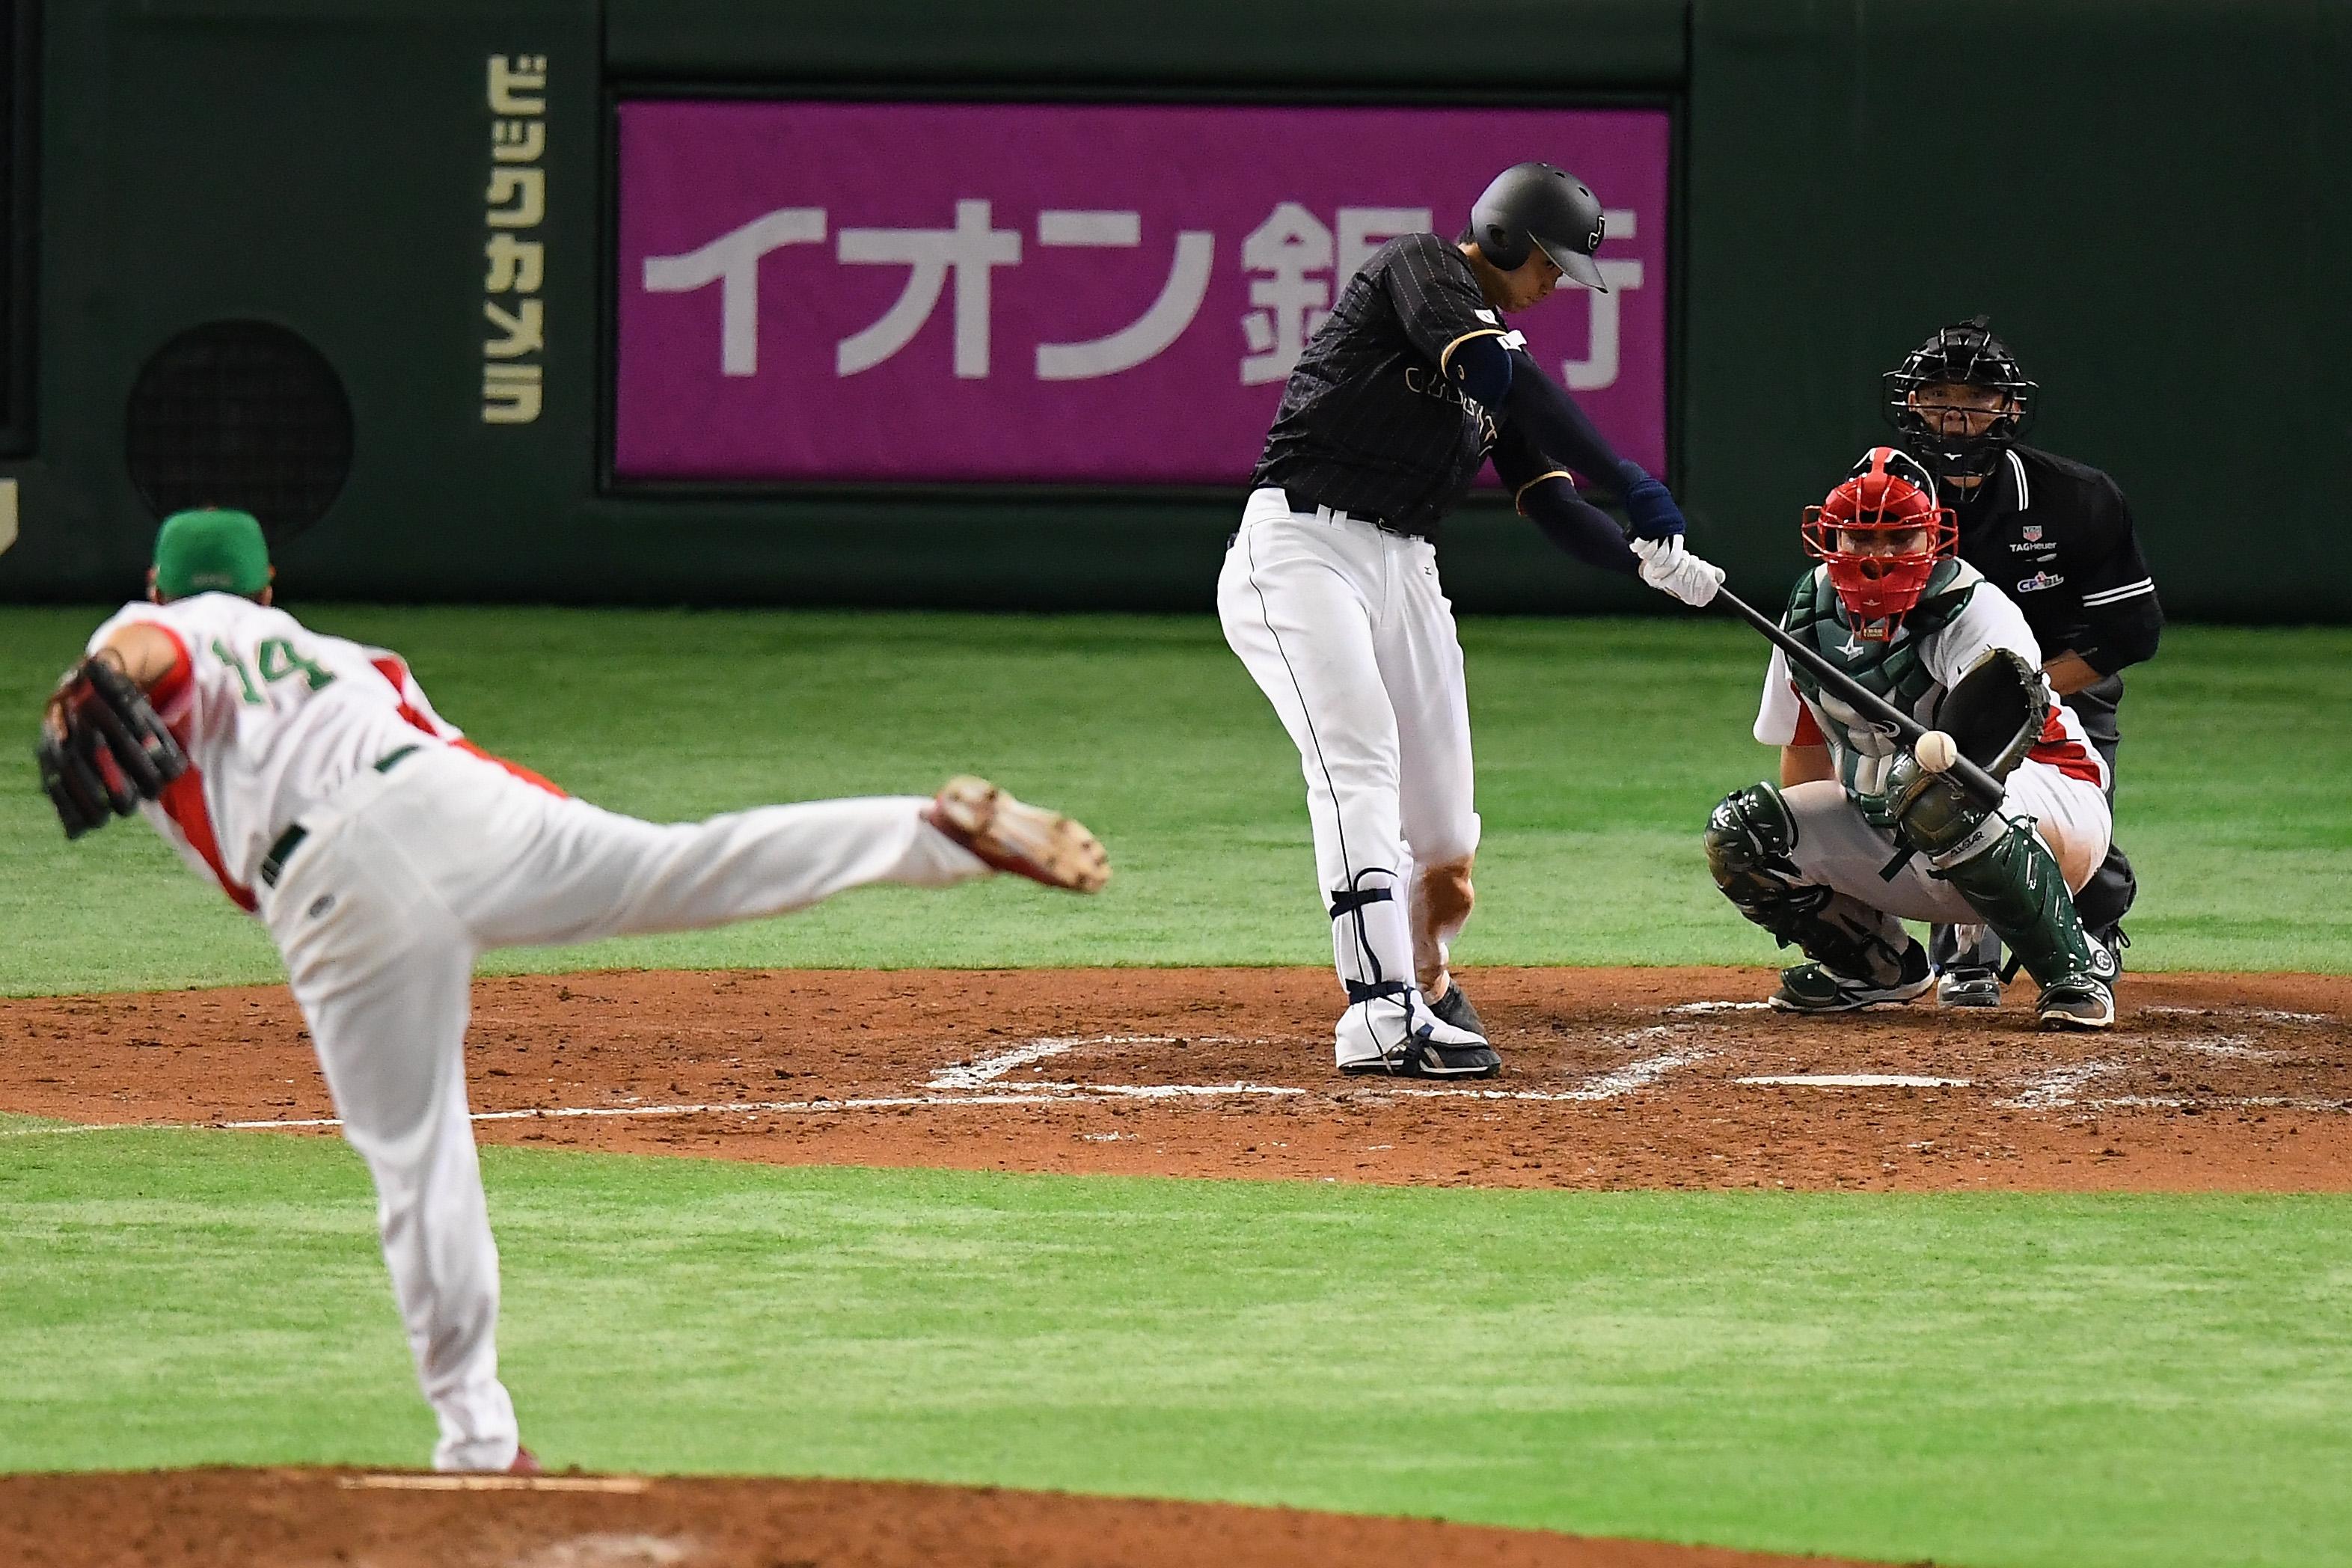 Shohei Otani Japan S Madison Bumgarner Launches A Baseball Into